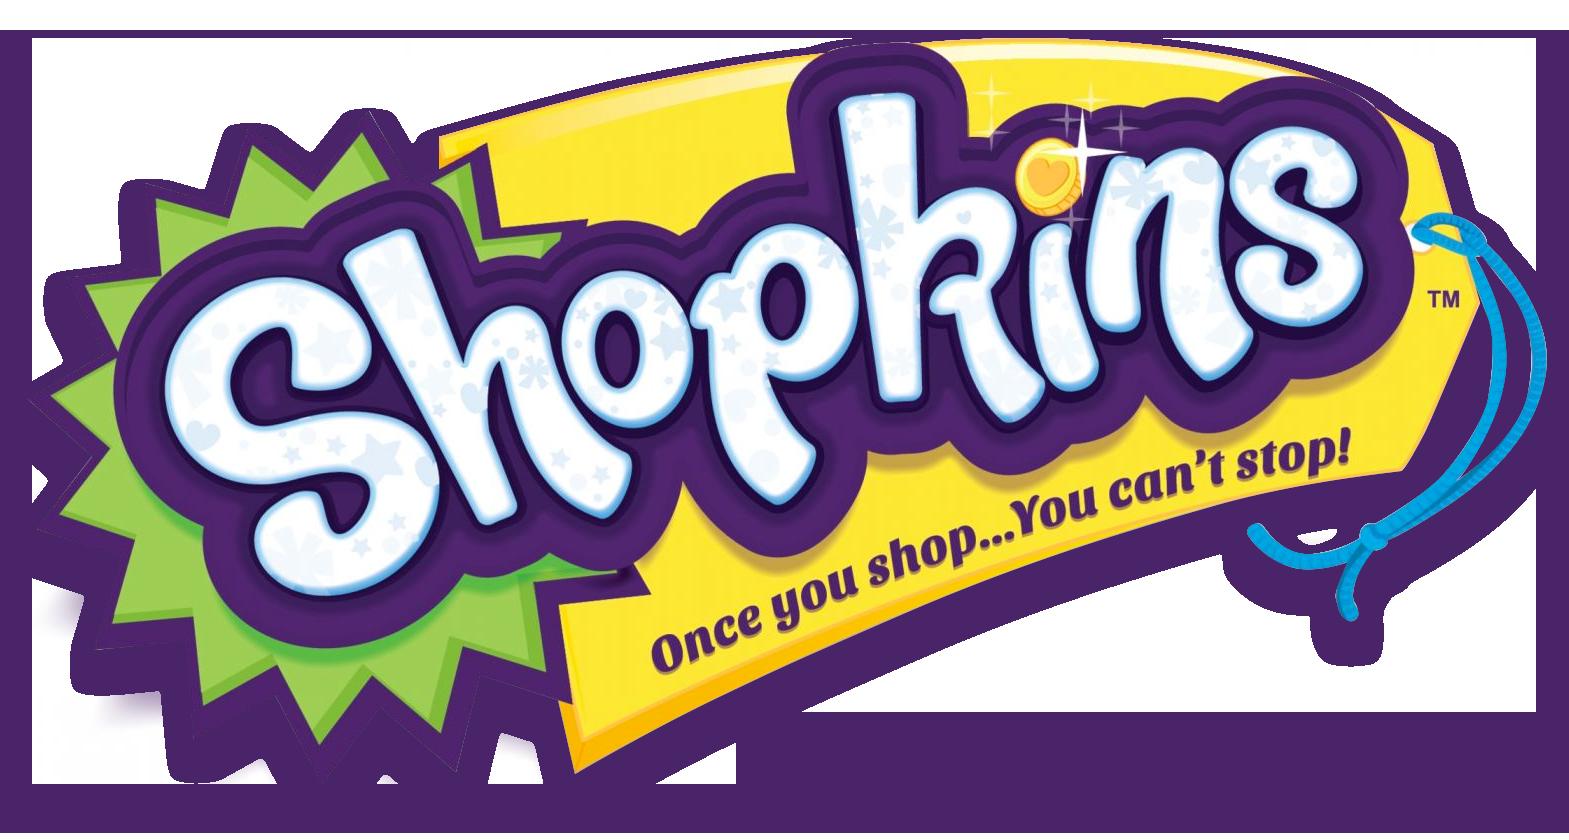 Shopkins logo clipart free clip black and white download Shopkins Logo | Shopkins | Pinterest | Shopkins, Logos and Birthdays clip black and white download